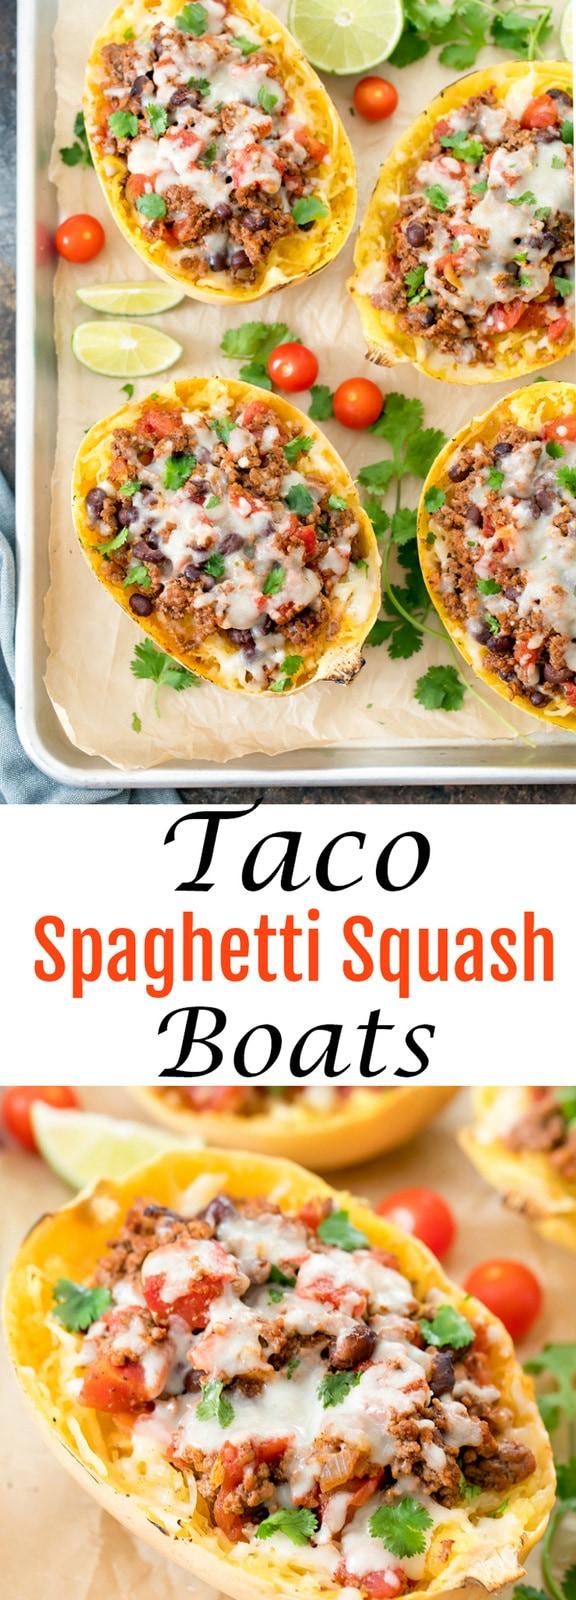 Taco Spaghetti Squash Boats. Low carb, easy, delicious alternative to taco pasta.